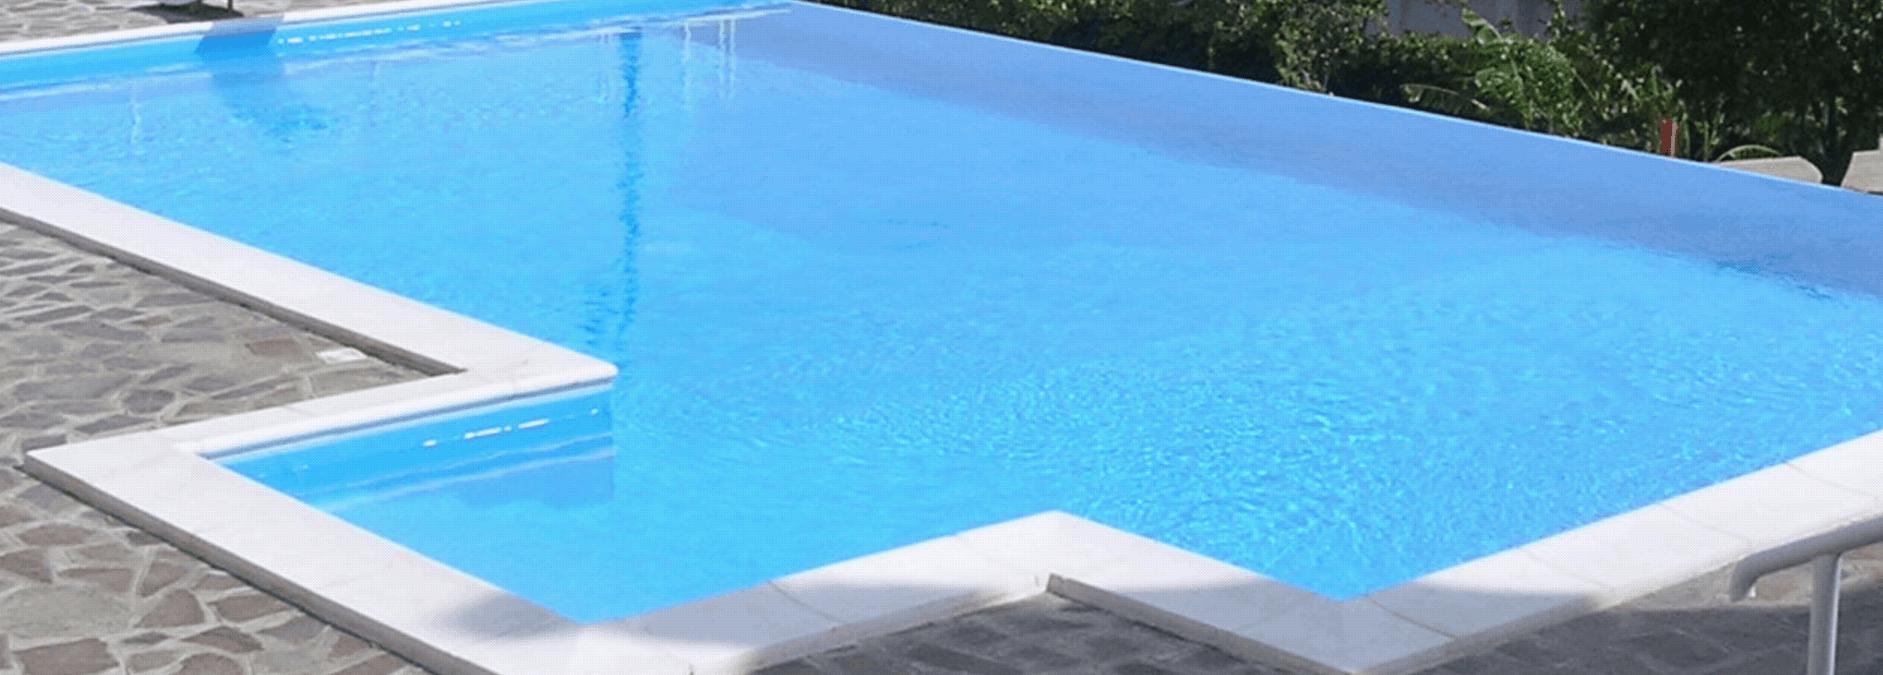 piscina forma astratta